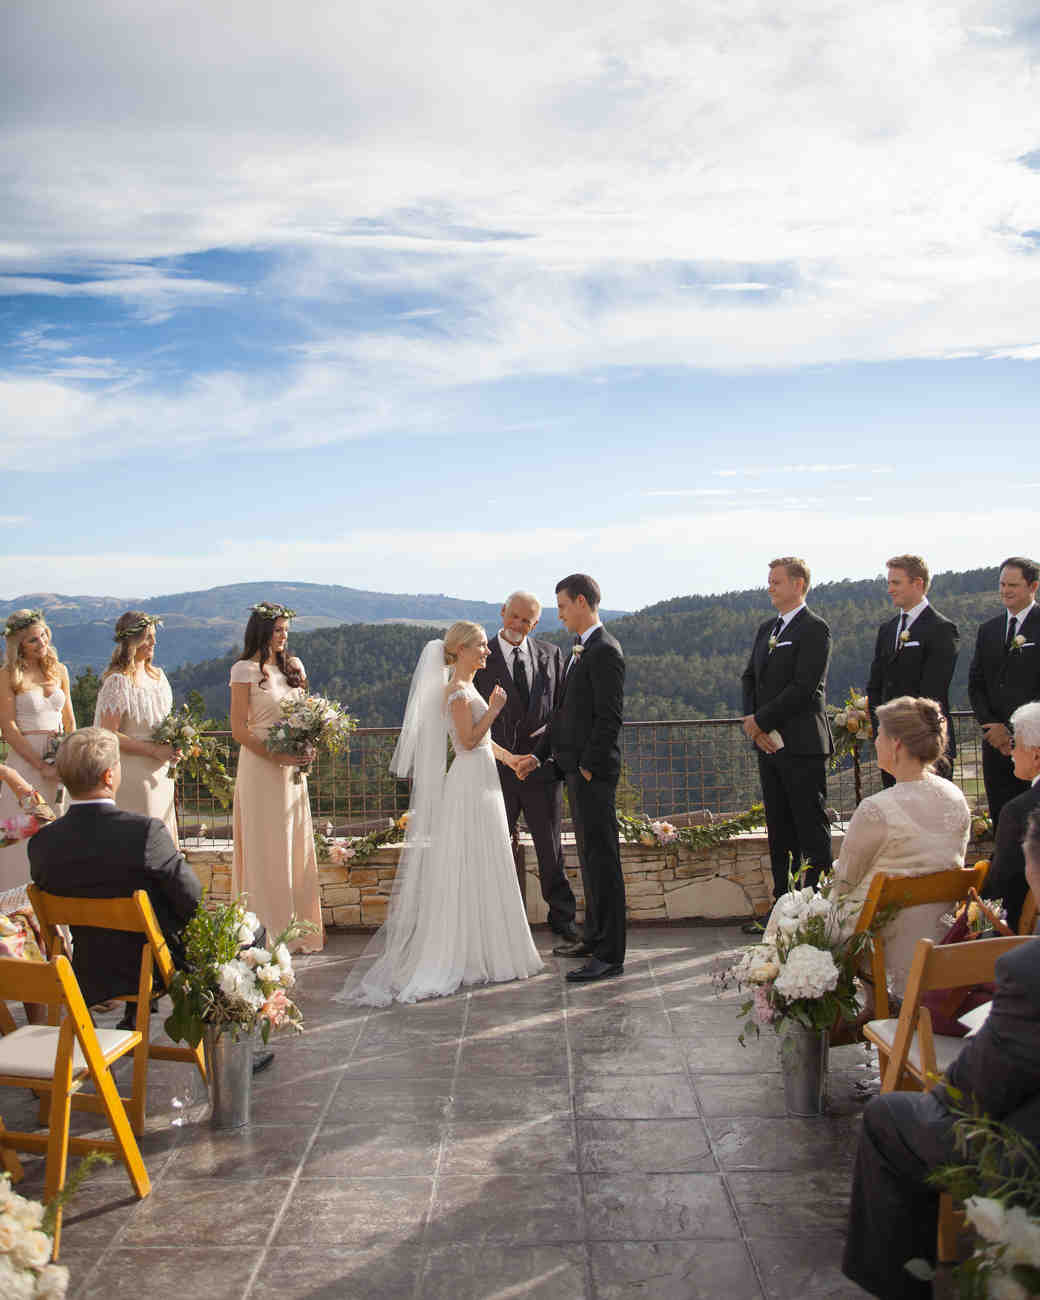 kristin-chris-wedding-ceremony-250-s112398-0116.jpg